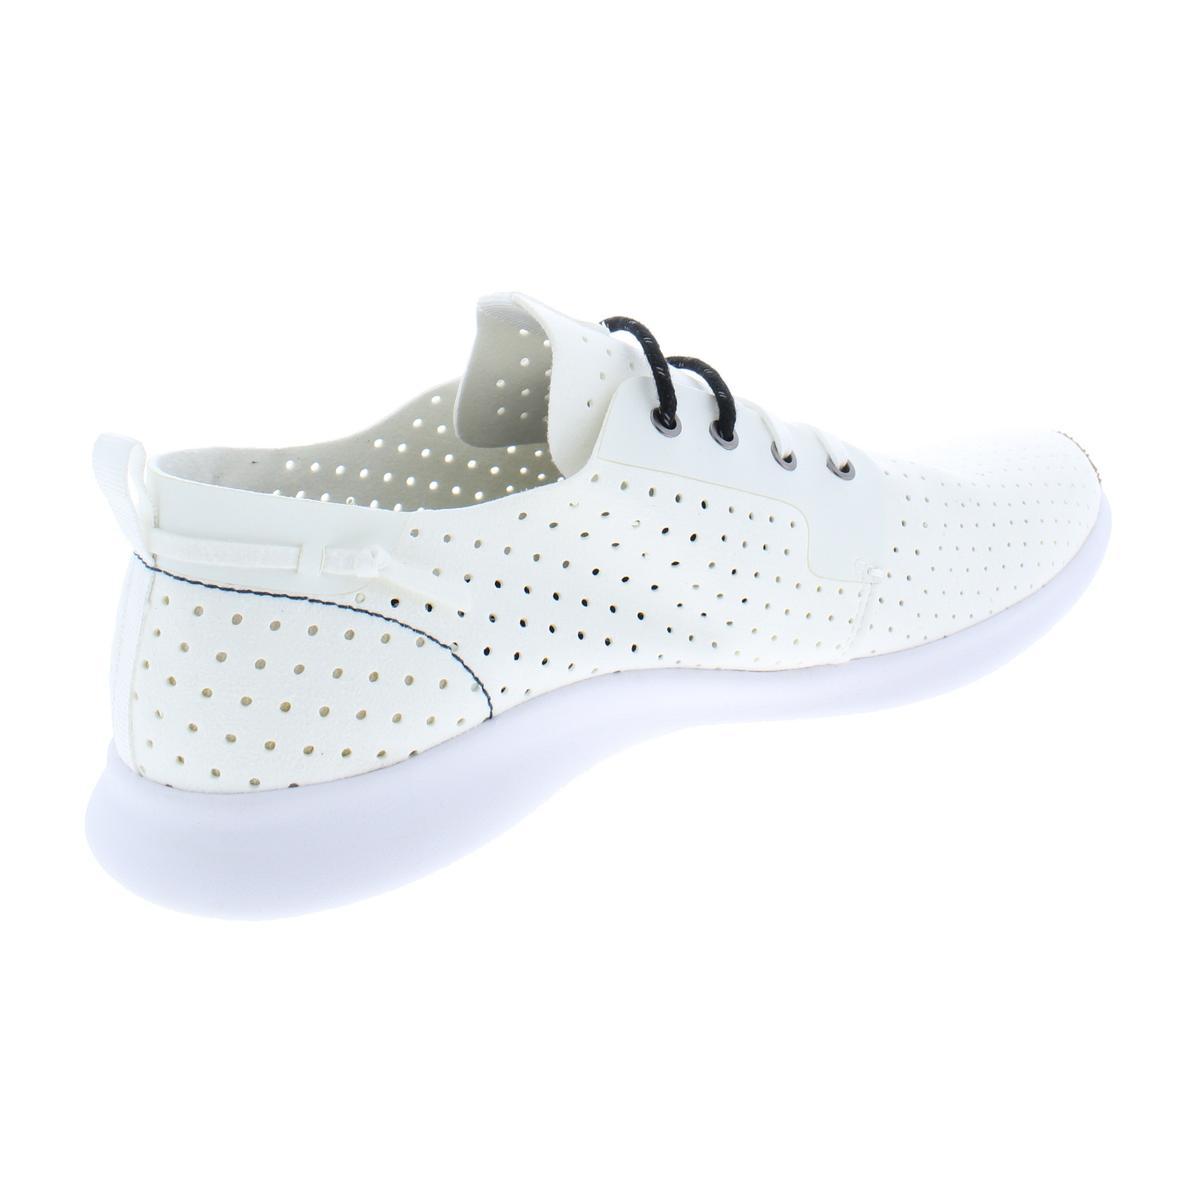 Steve-Madden-Men-039-s-Brick-Faux-Suede-Athletic-Fashion-Sneaker-Trainers-Shoes thumbnail 8